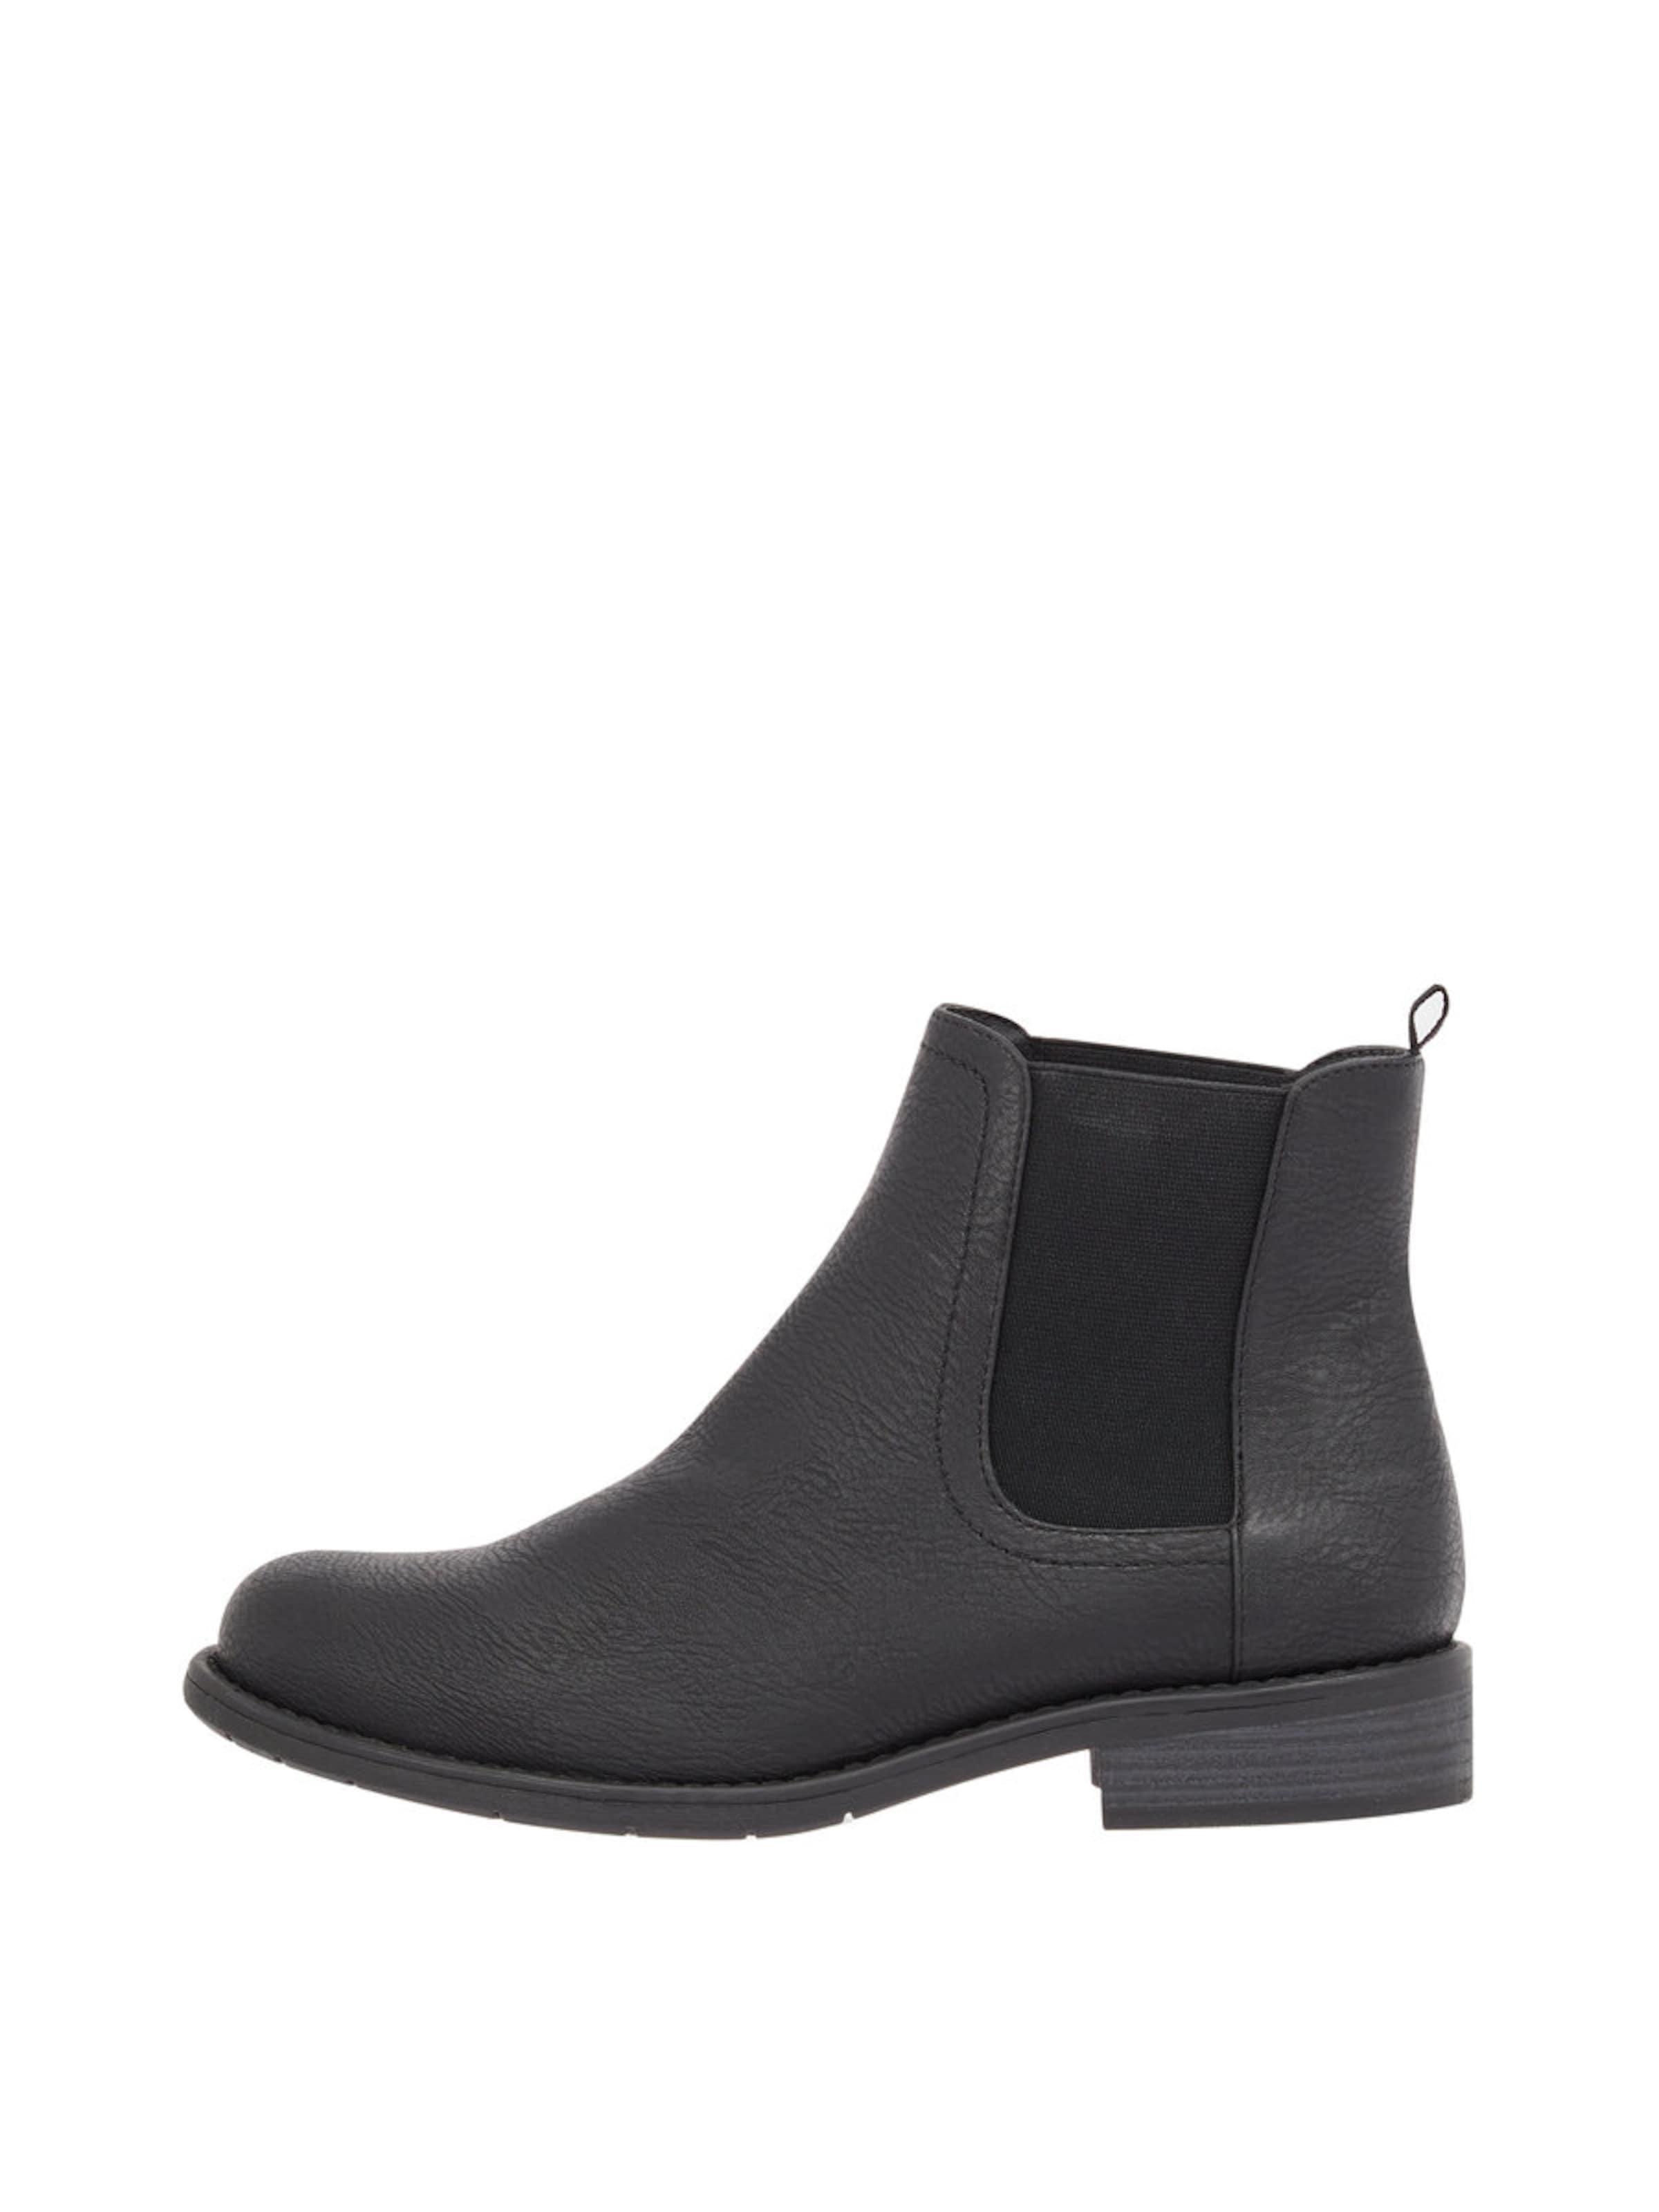 Ankle Boots Bianco 'chelsea' In Schwarz 8nPkXOw0